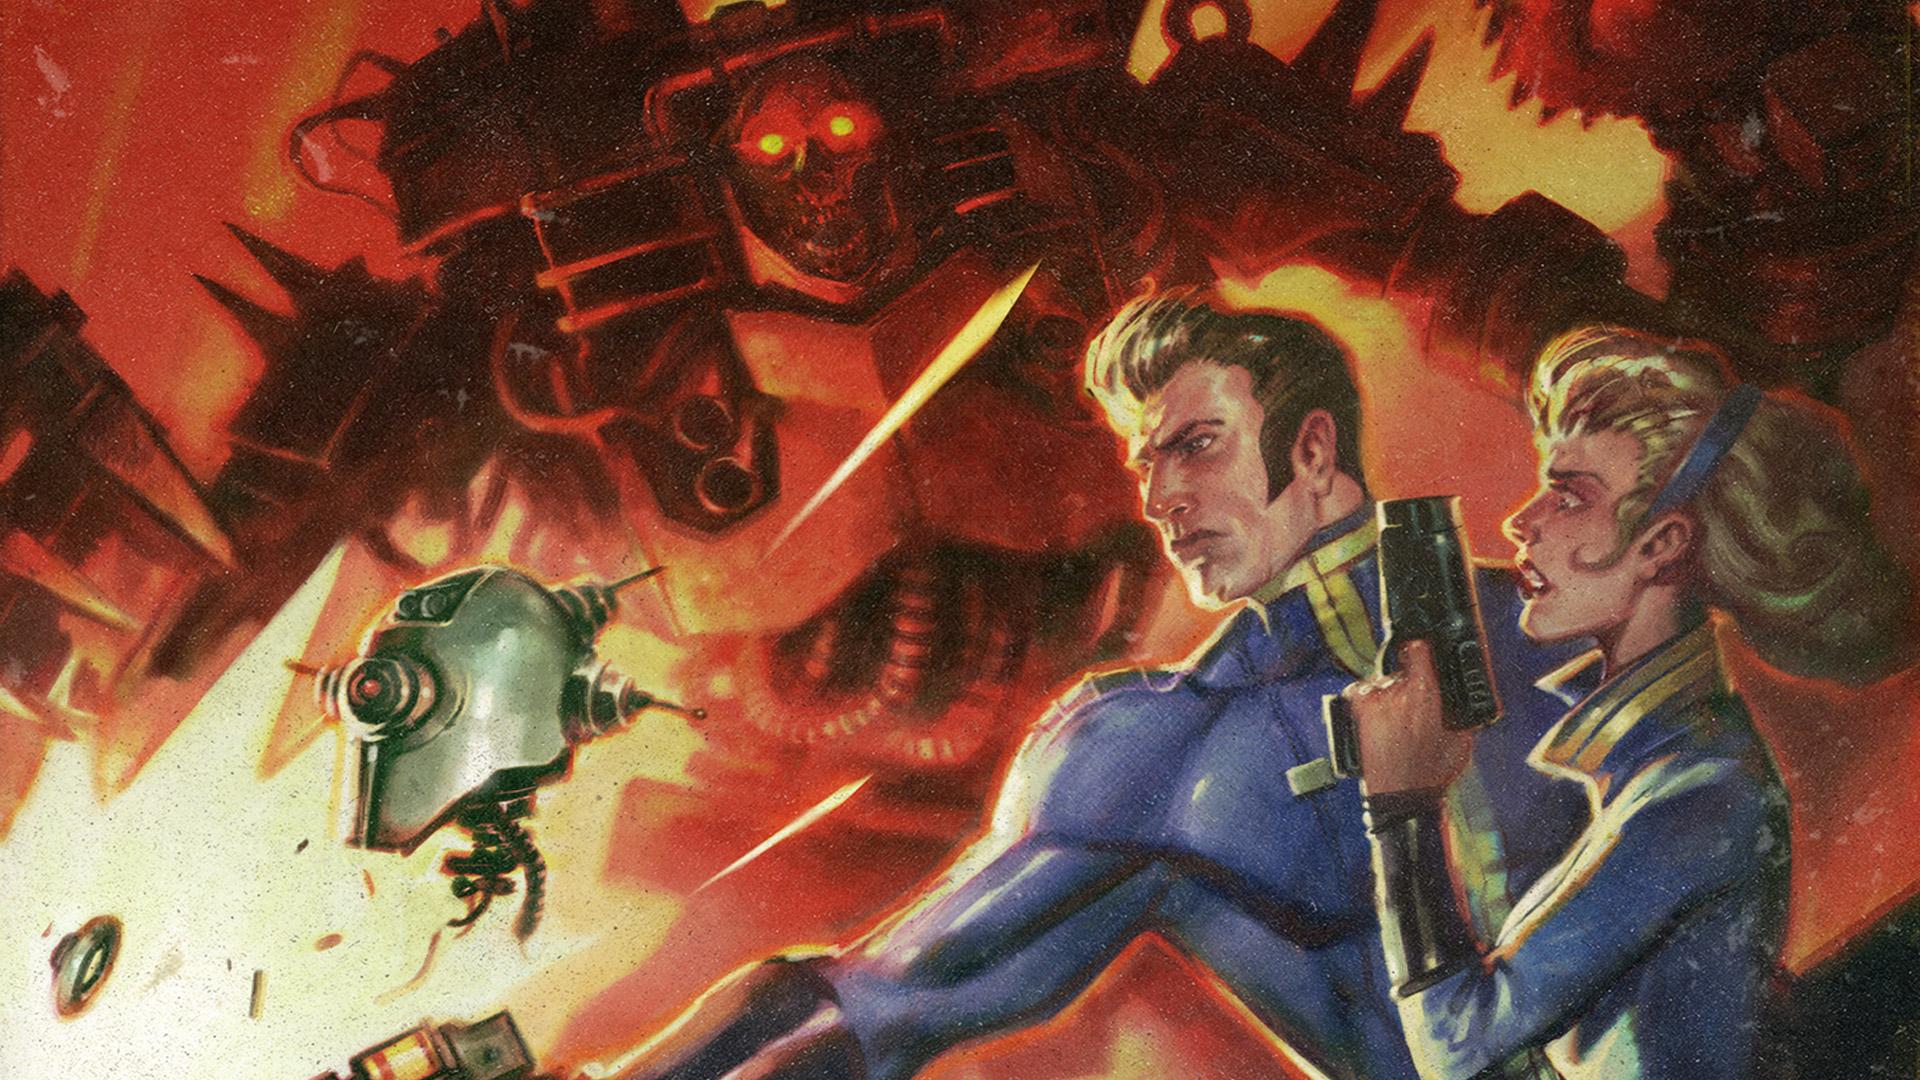 Fallout 4 Wallpaper in 1920x1080 1920x1080